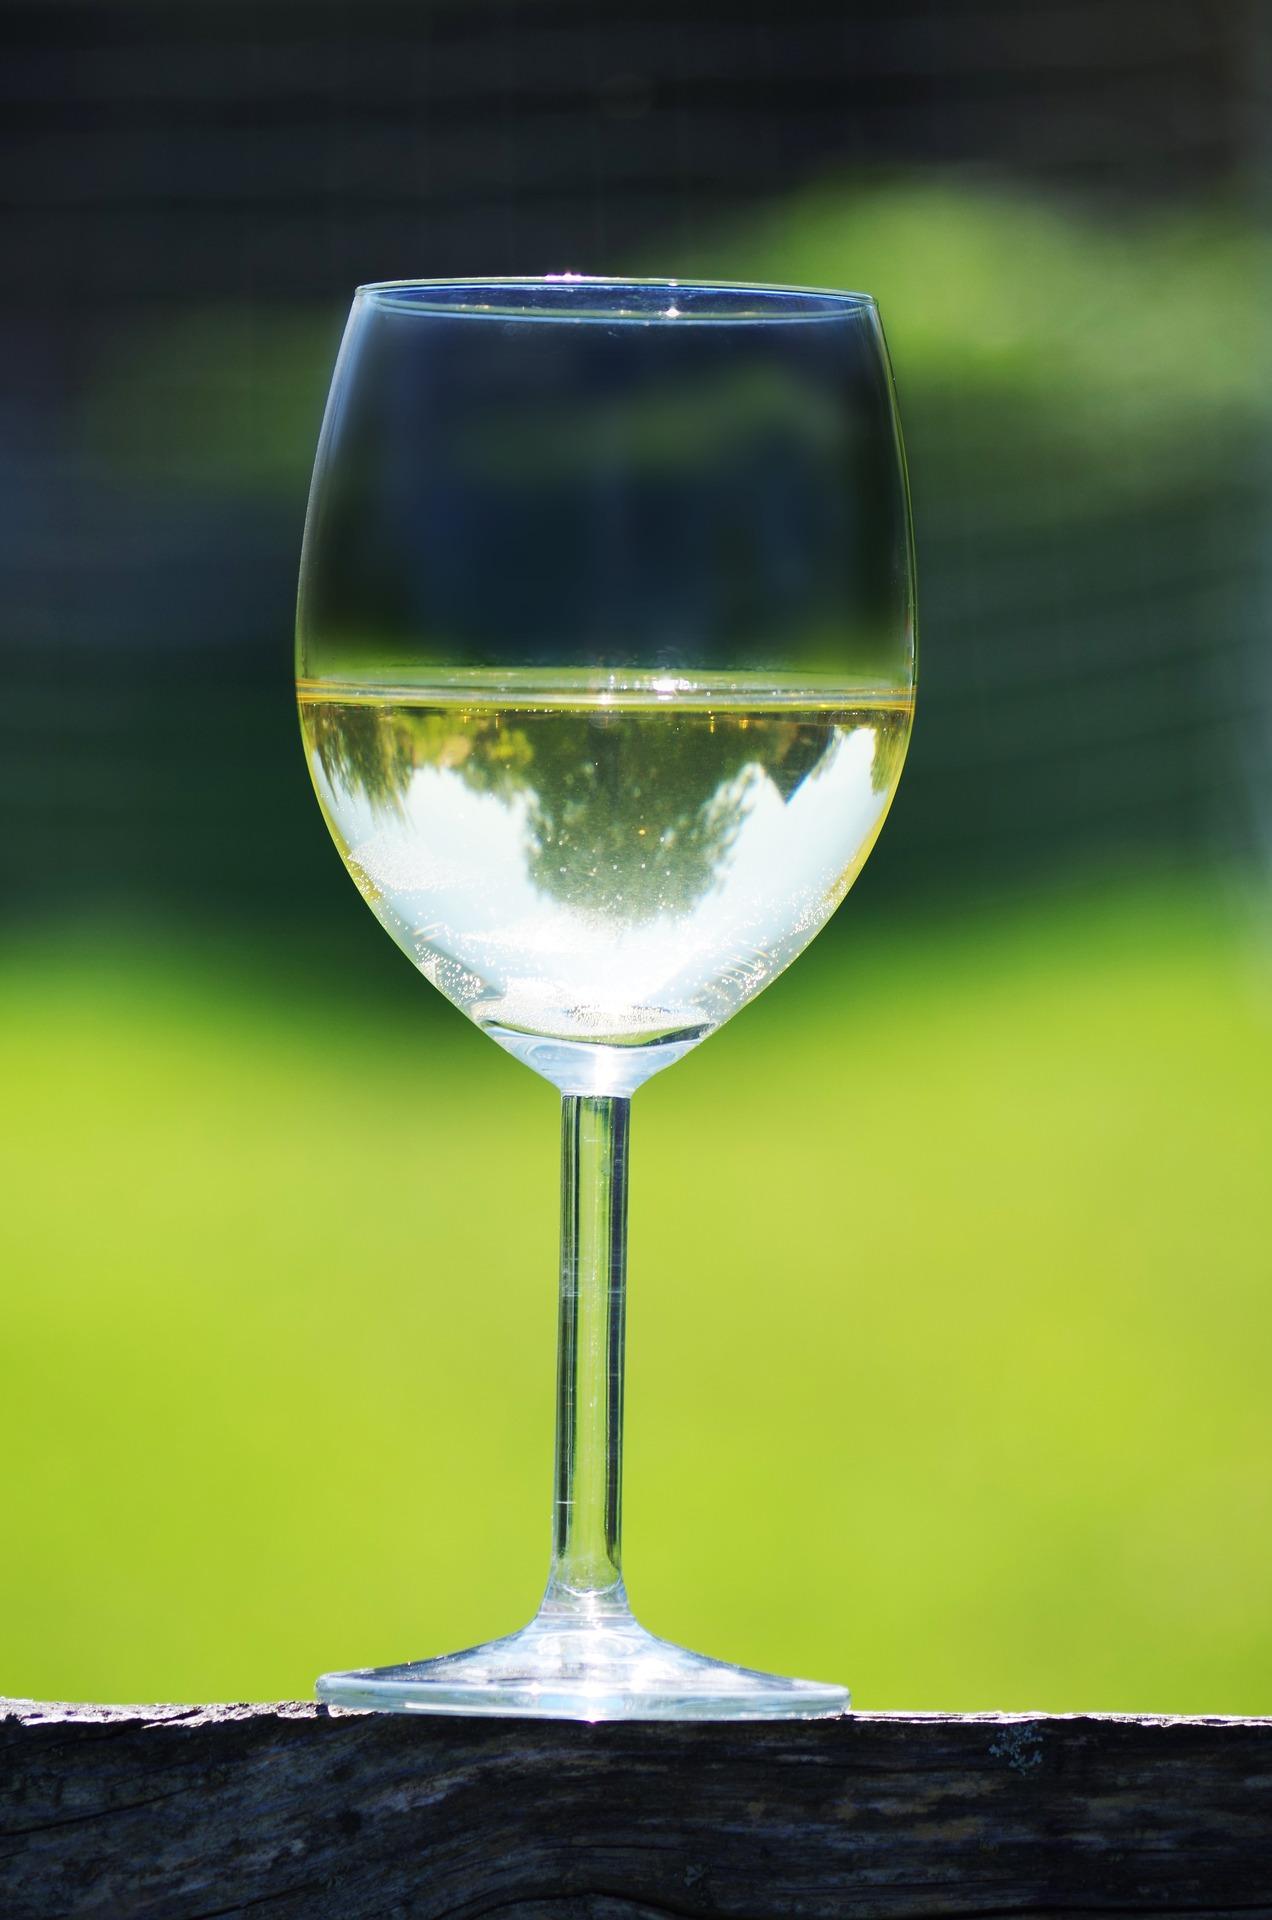 wine-1580394_1920.jpg